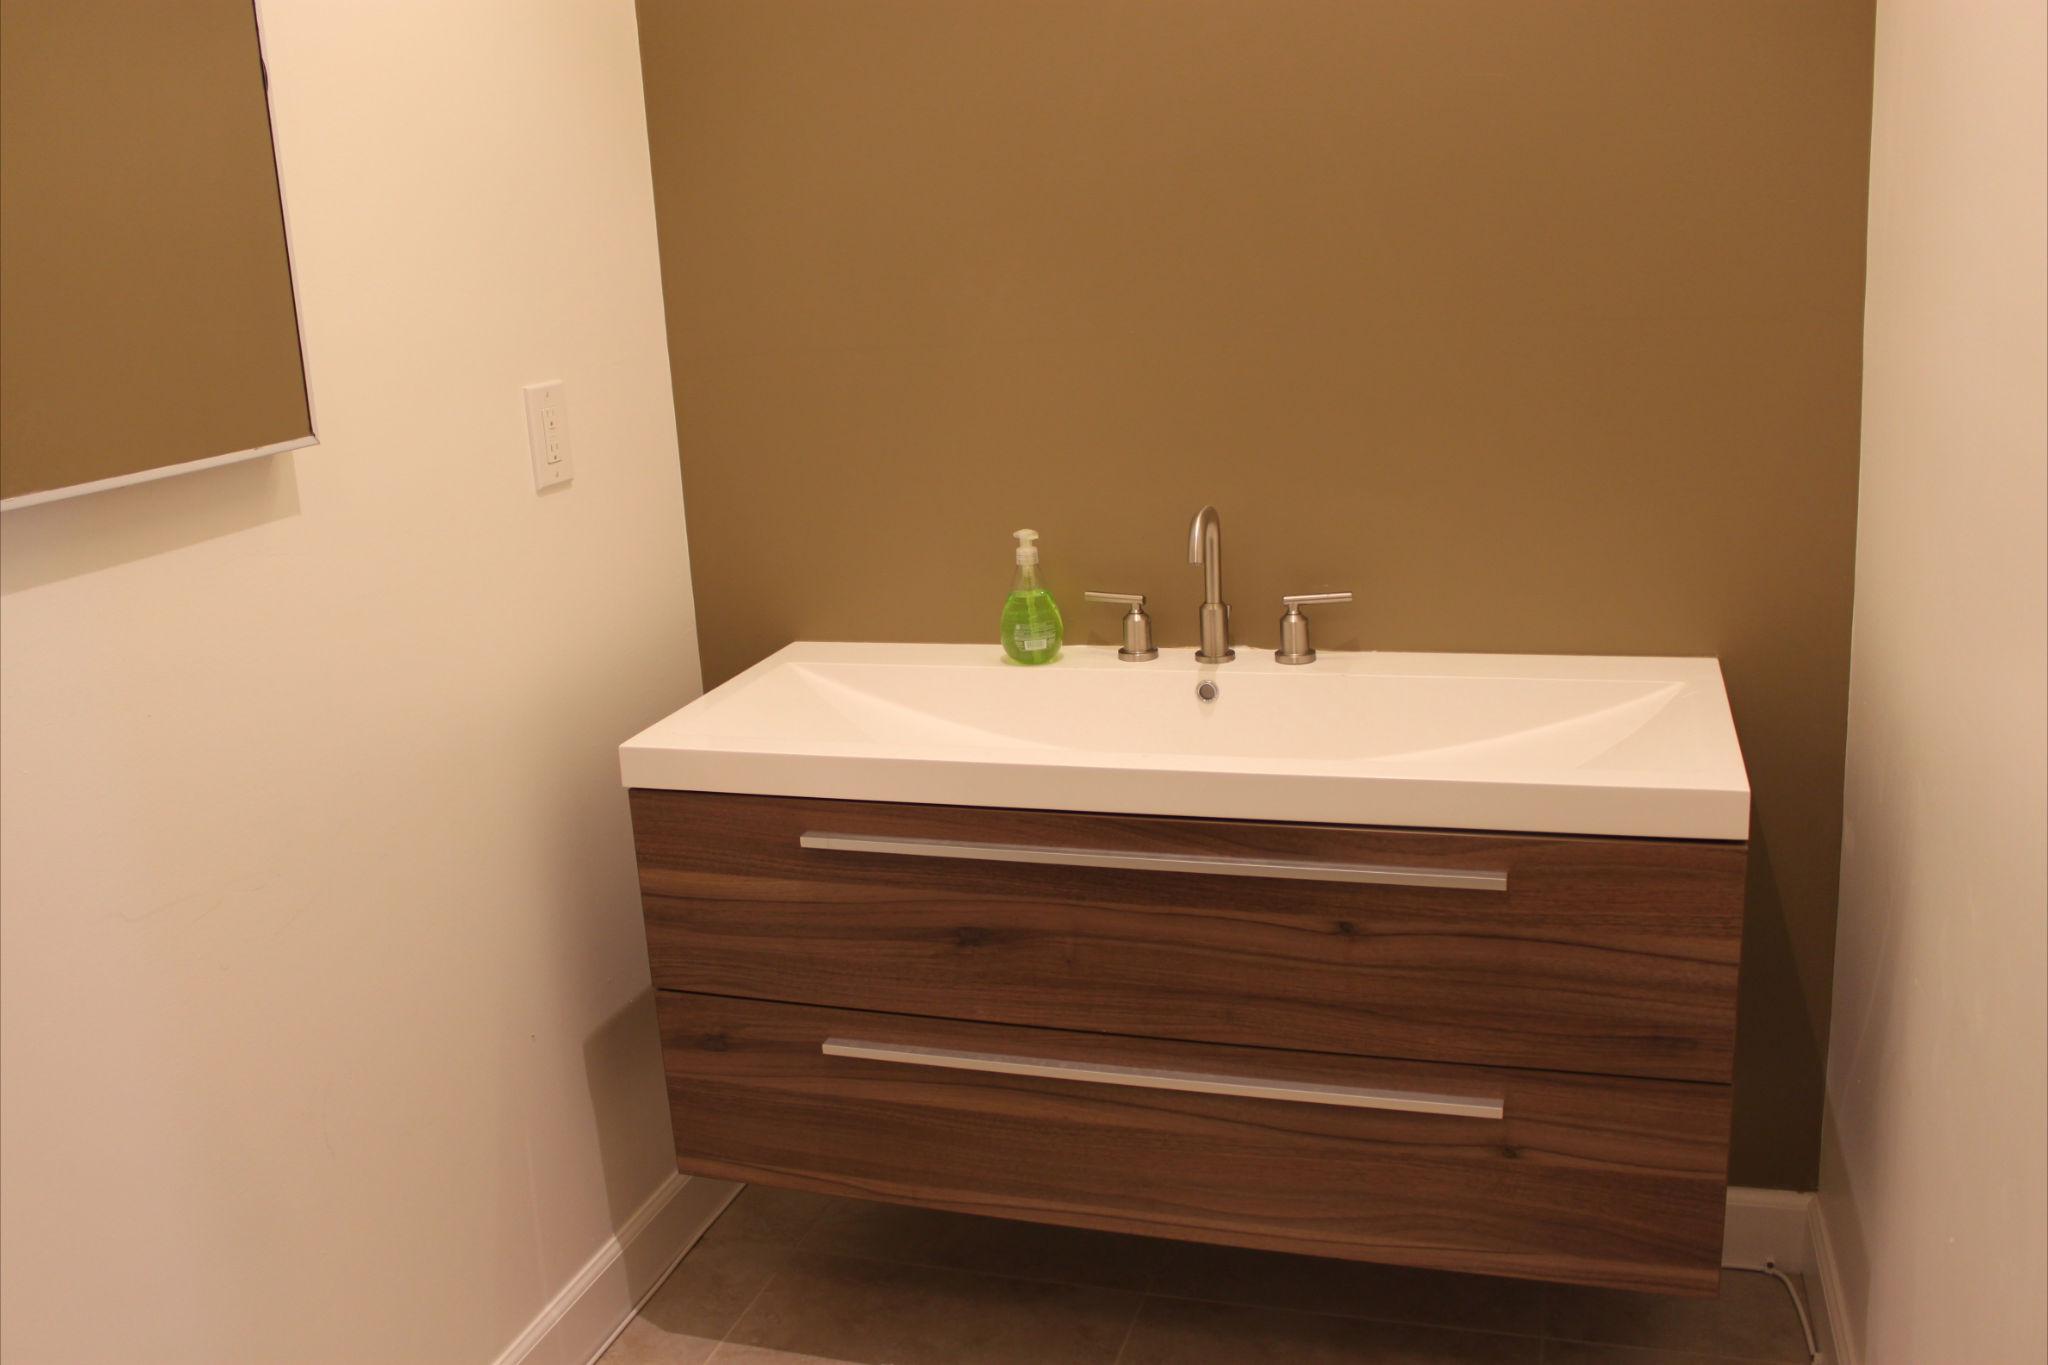 remodel works bath & kitchen towel bars ca